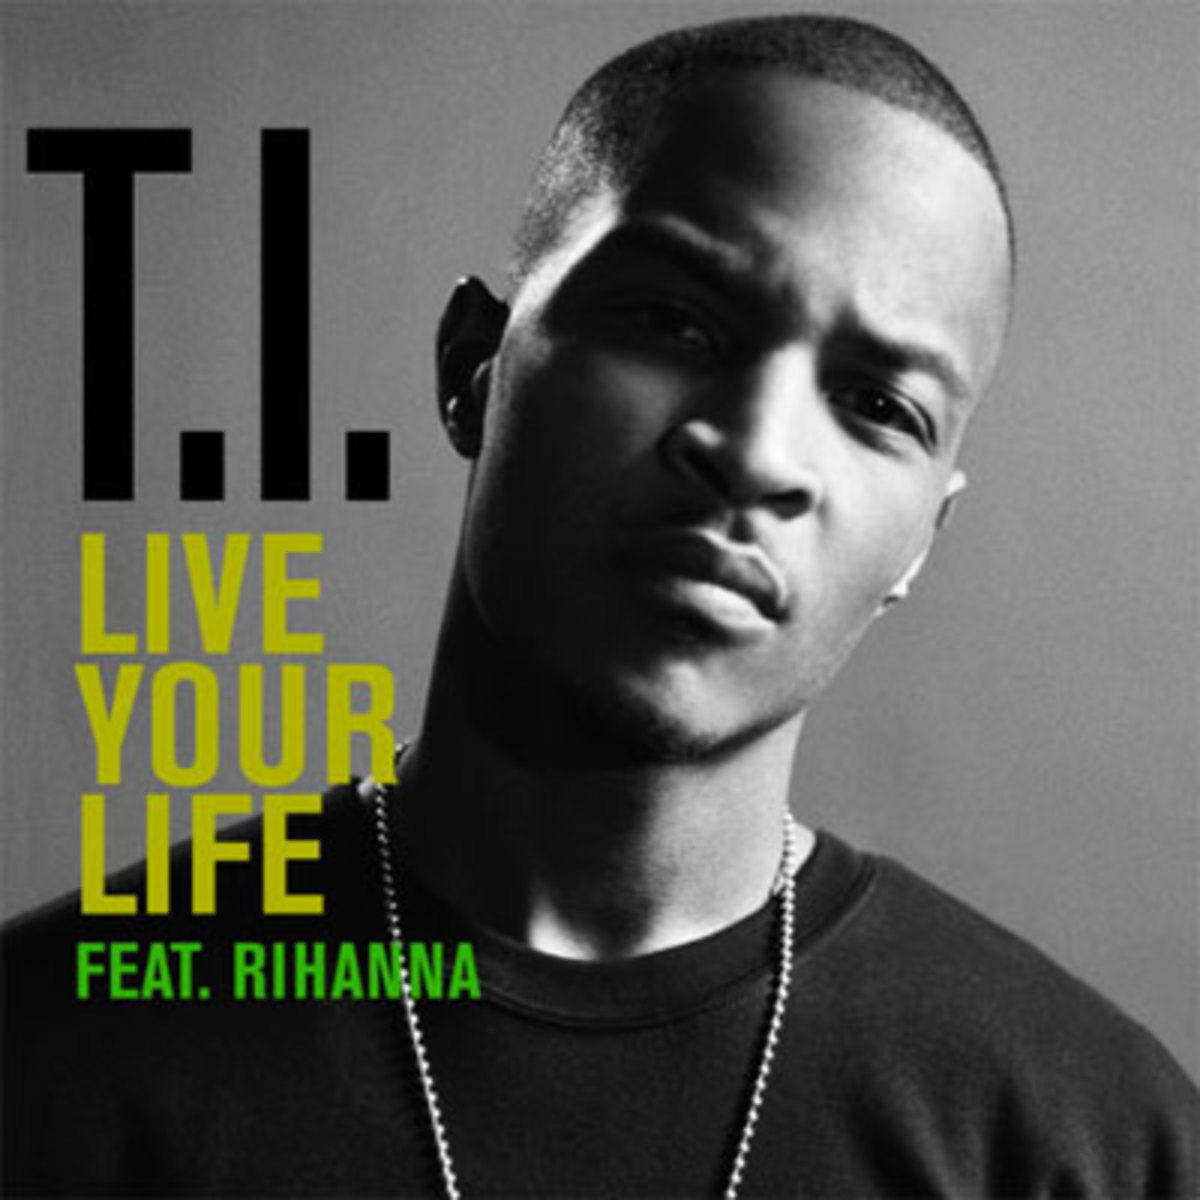 ti-liveyourlife.jpg